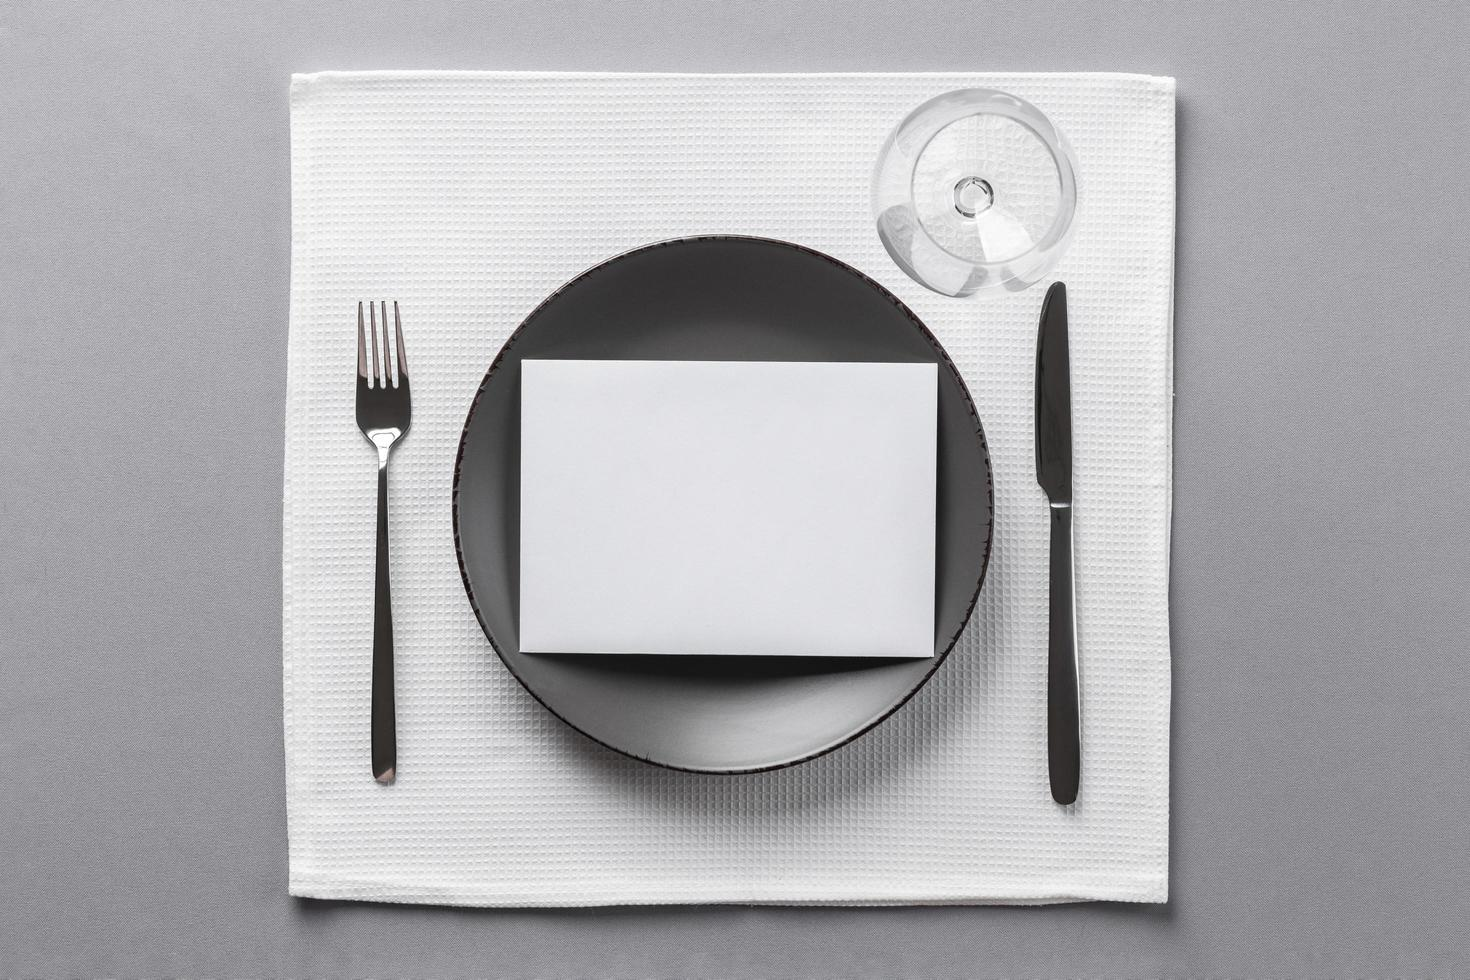 minimalistische tafelsetting foto